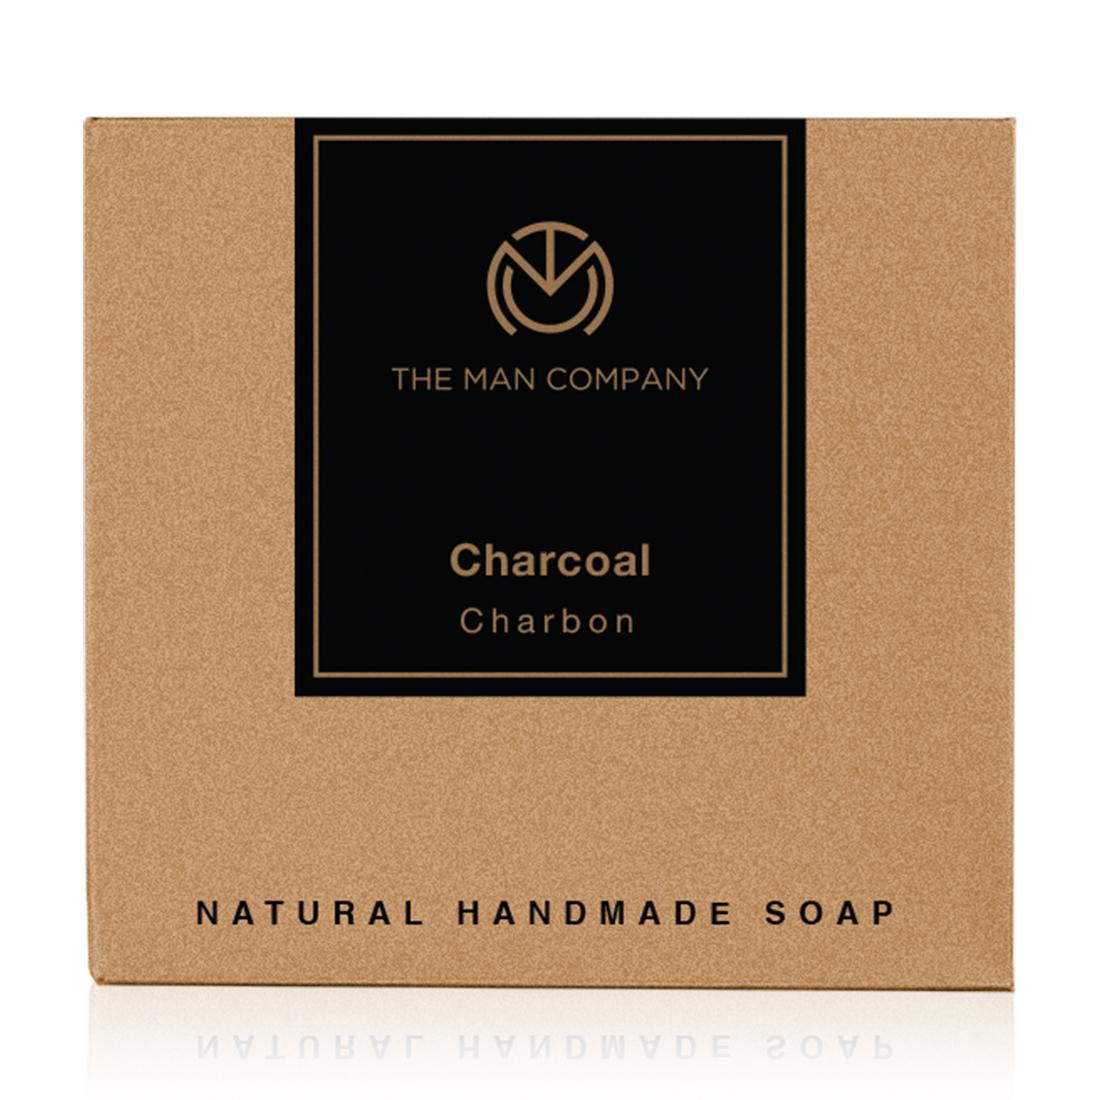 The Man Company | The Man Company Charcoal Soap Bar Black 125g